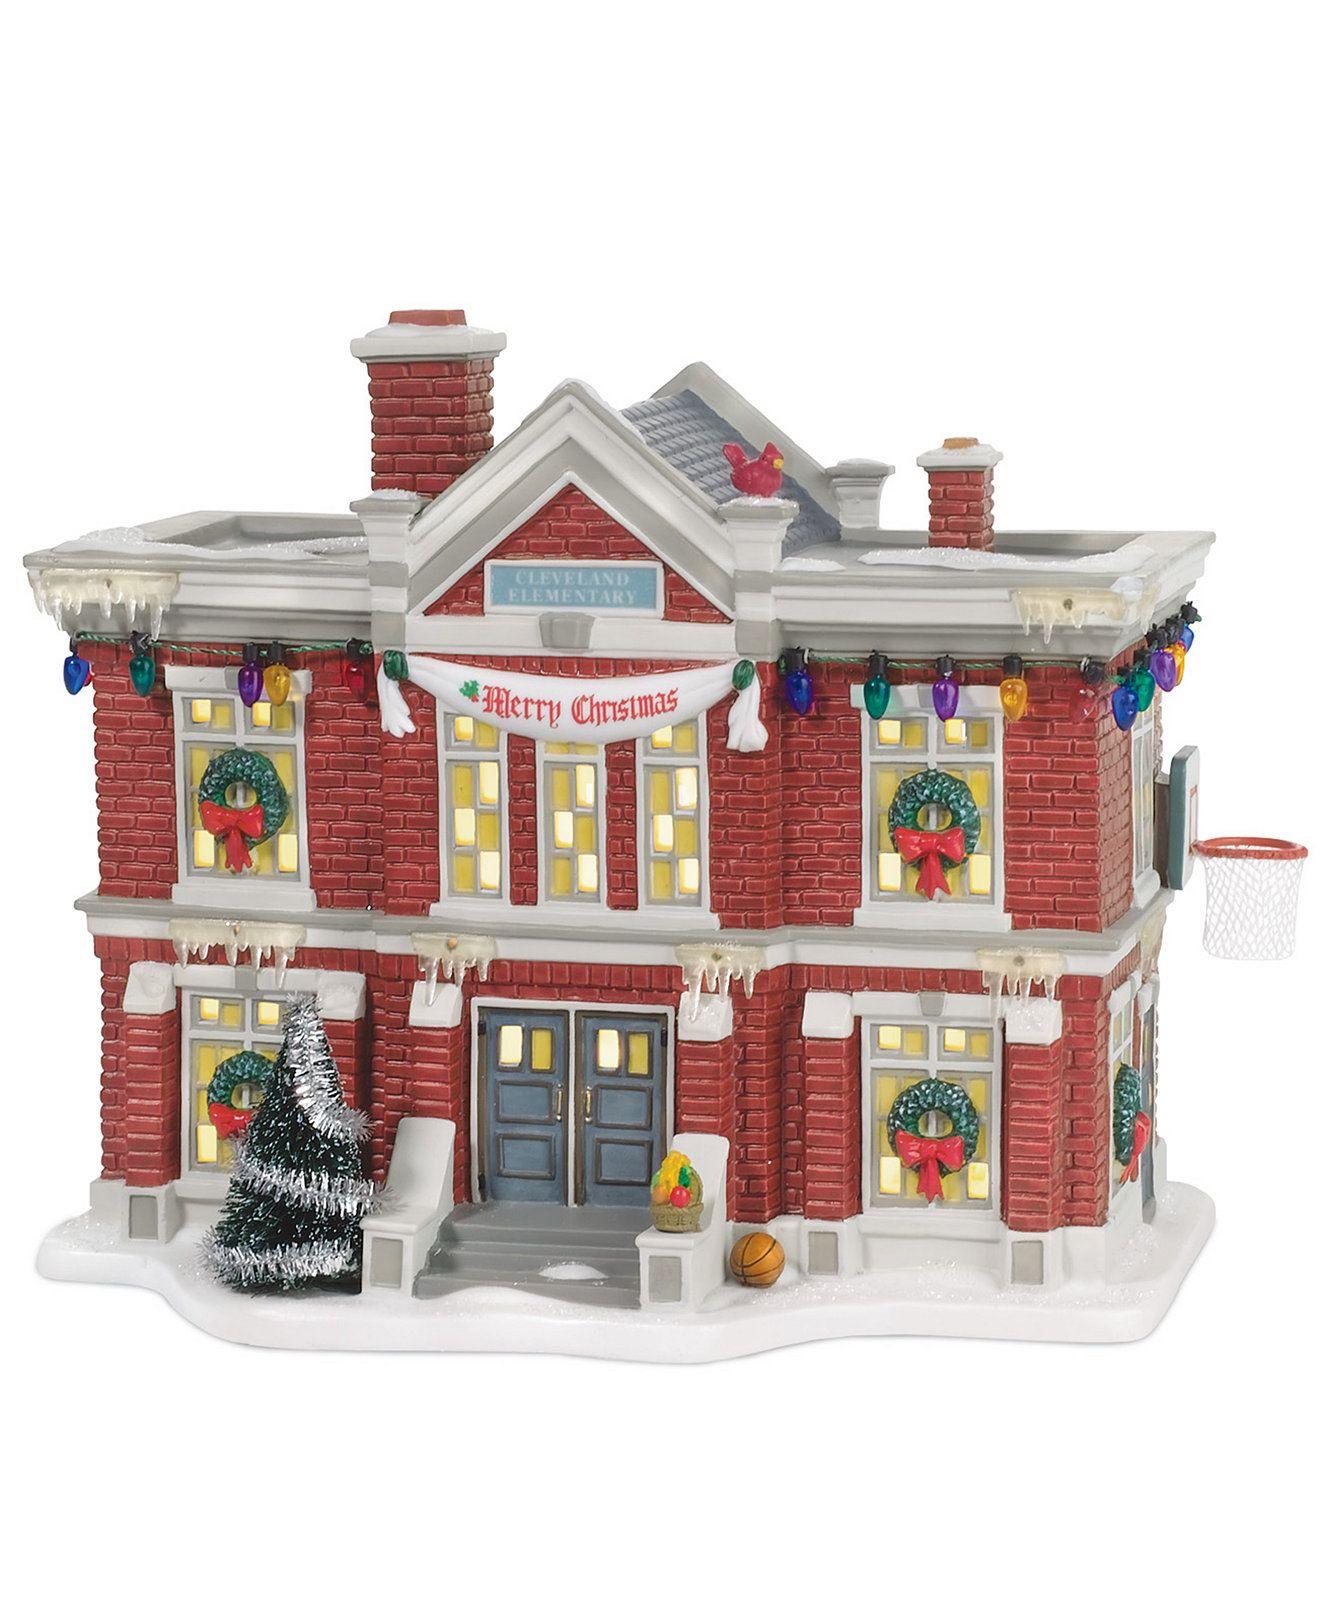 Light Cord For Christmas Village